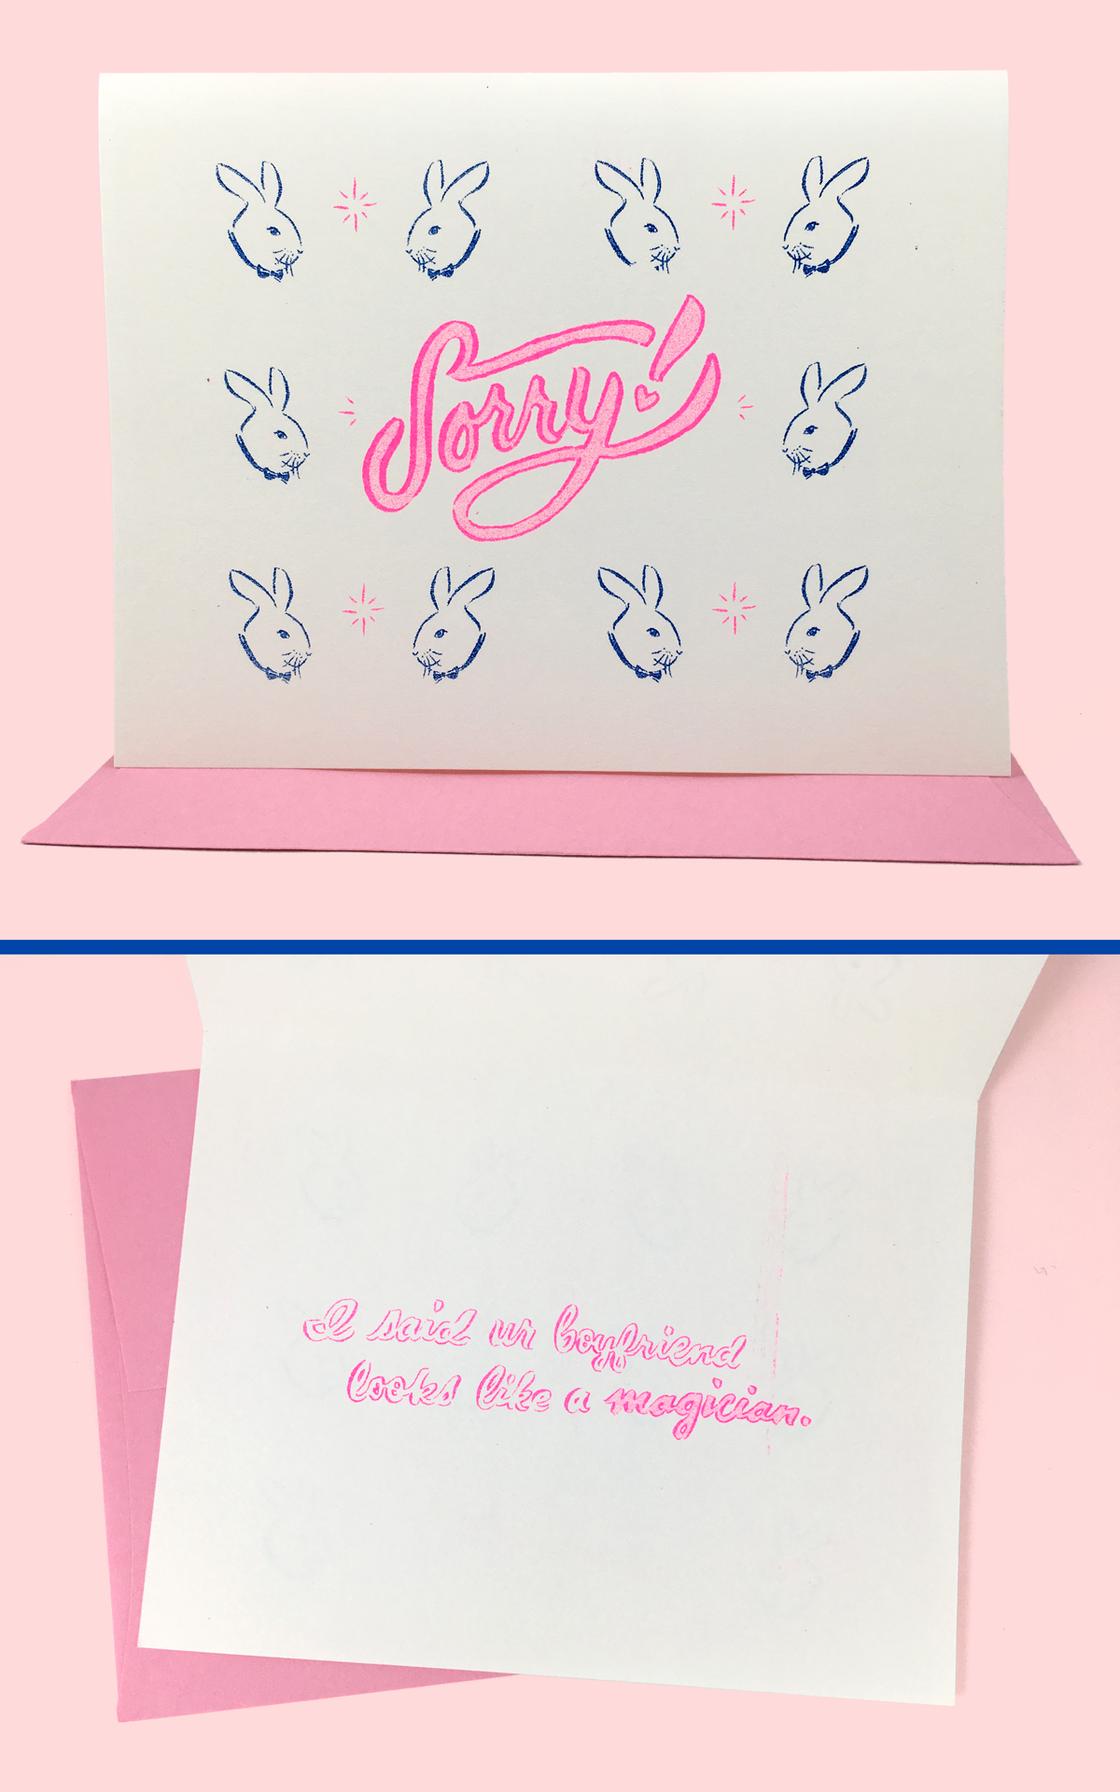 Image of Alliewachisms greeting cards – Alliewach x Eythink